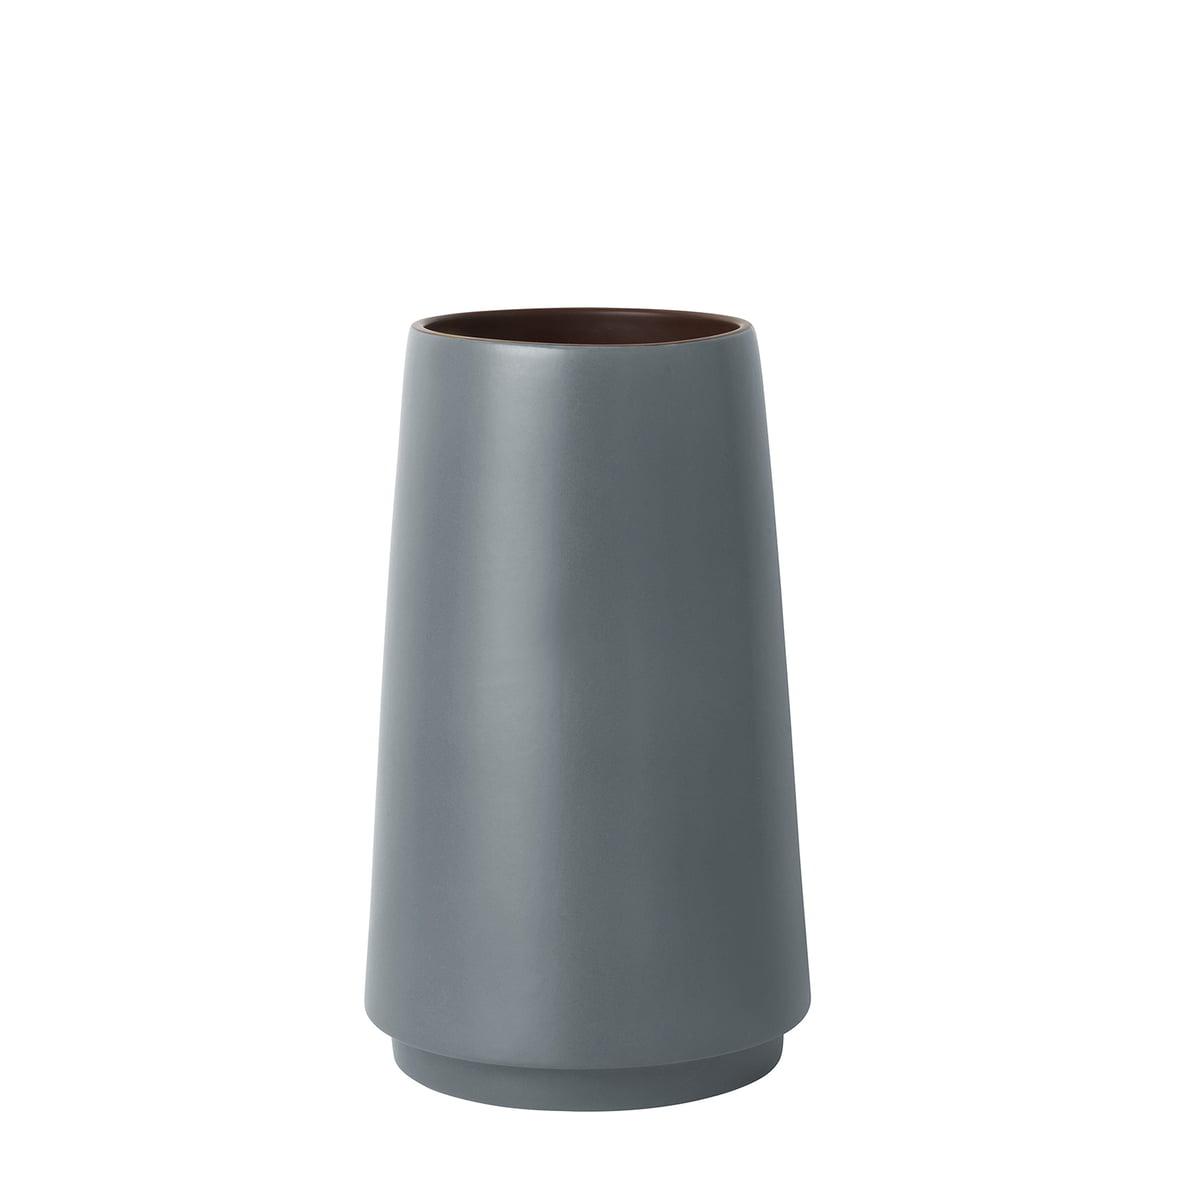 ferm Living - Dual Bodenvase klein, H 31 cm, grau | Dekoration > Vasen > Bodenvasen | Grau | ferm living